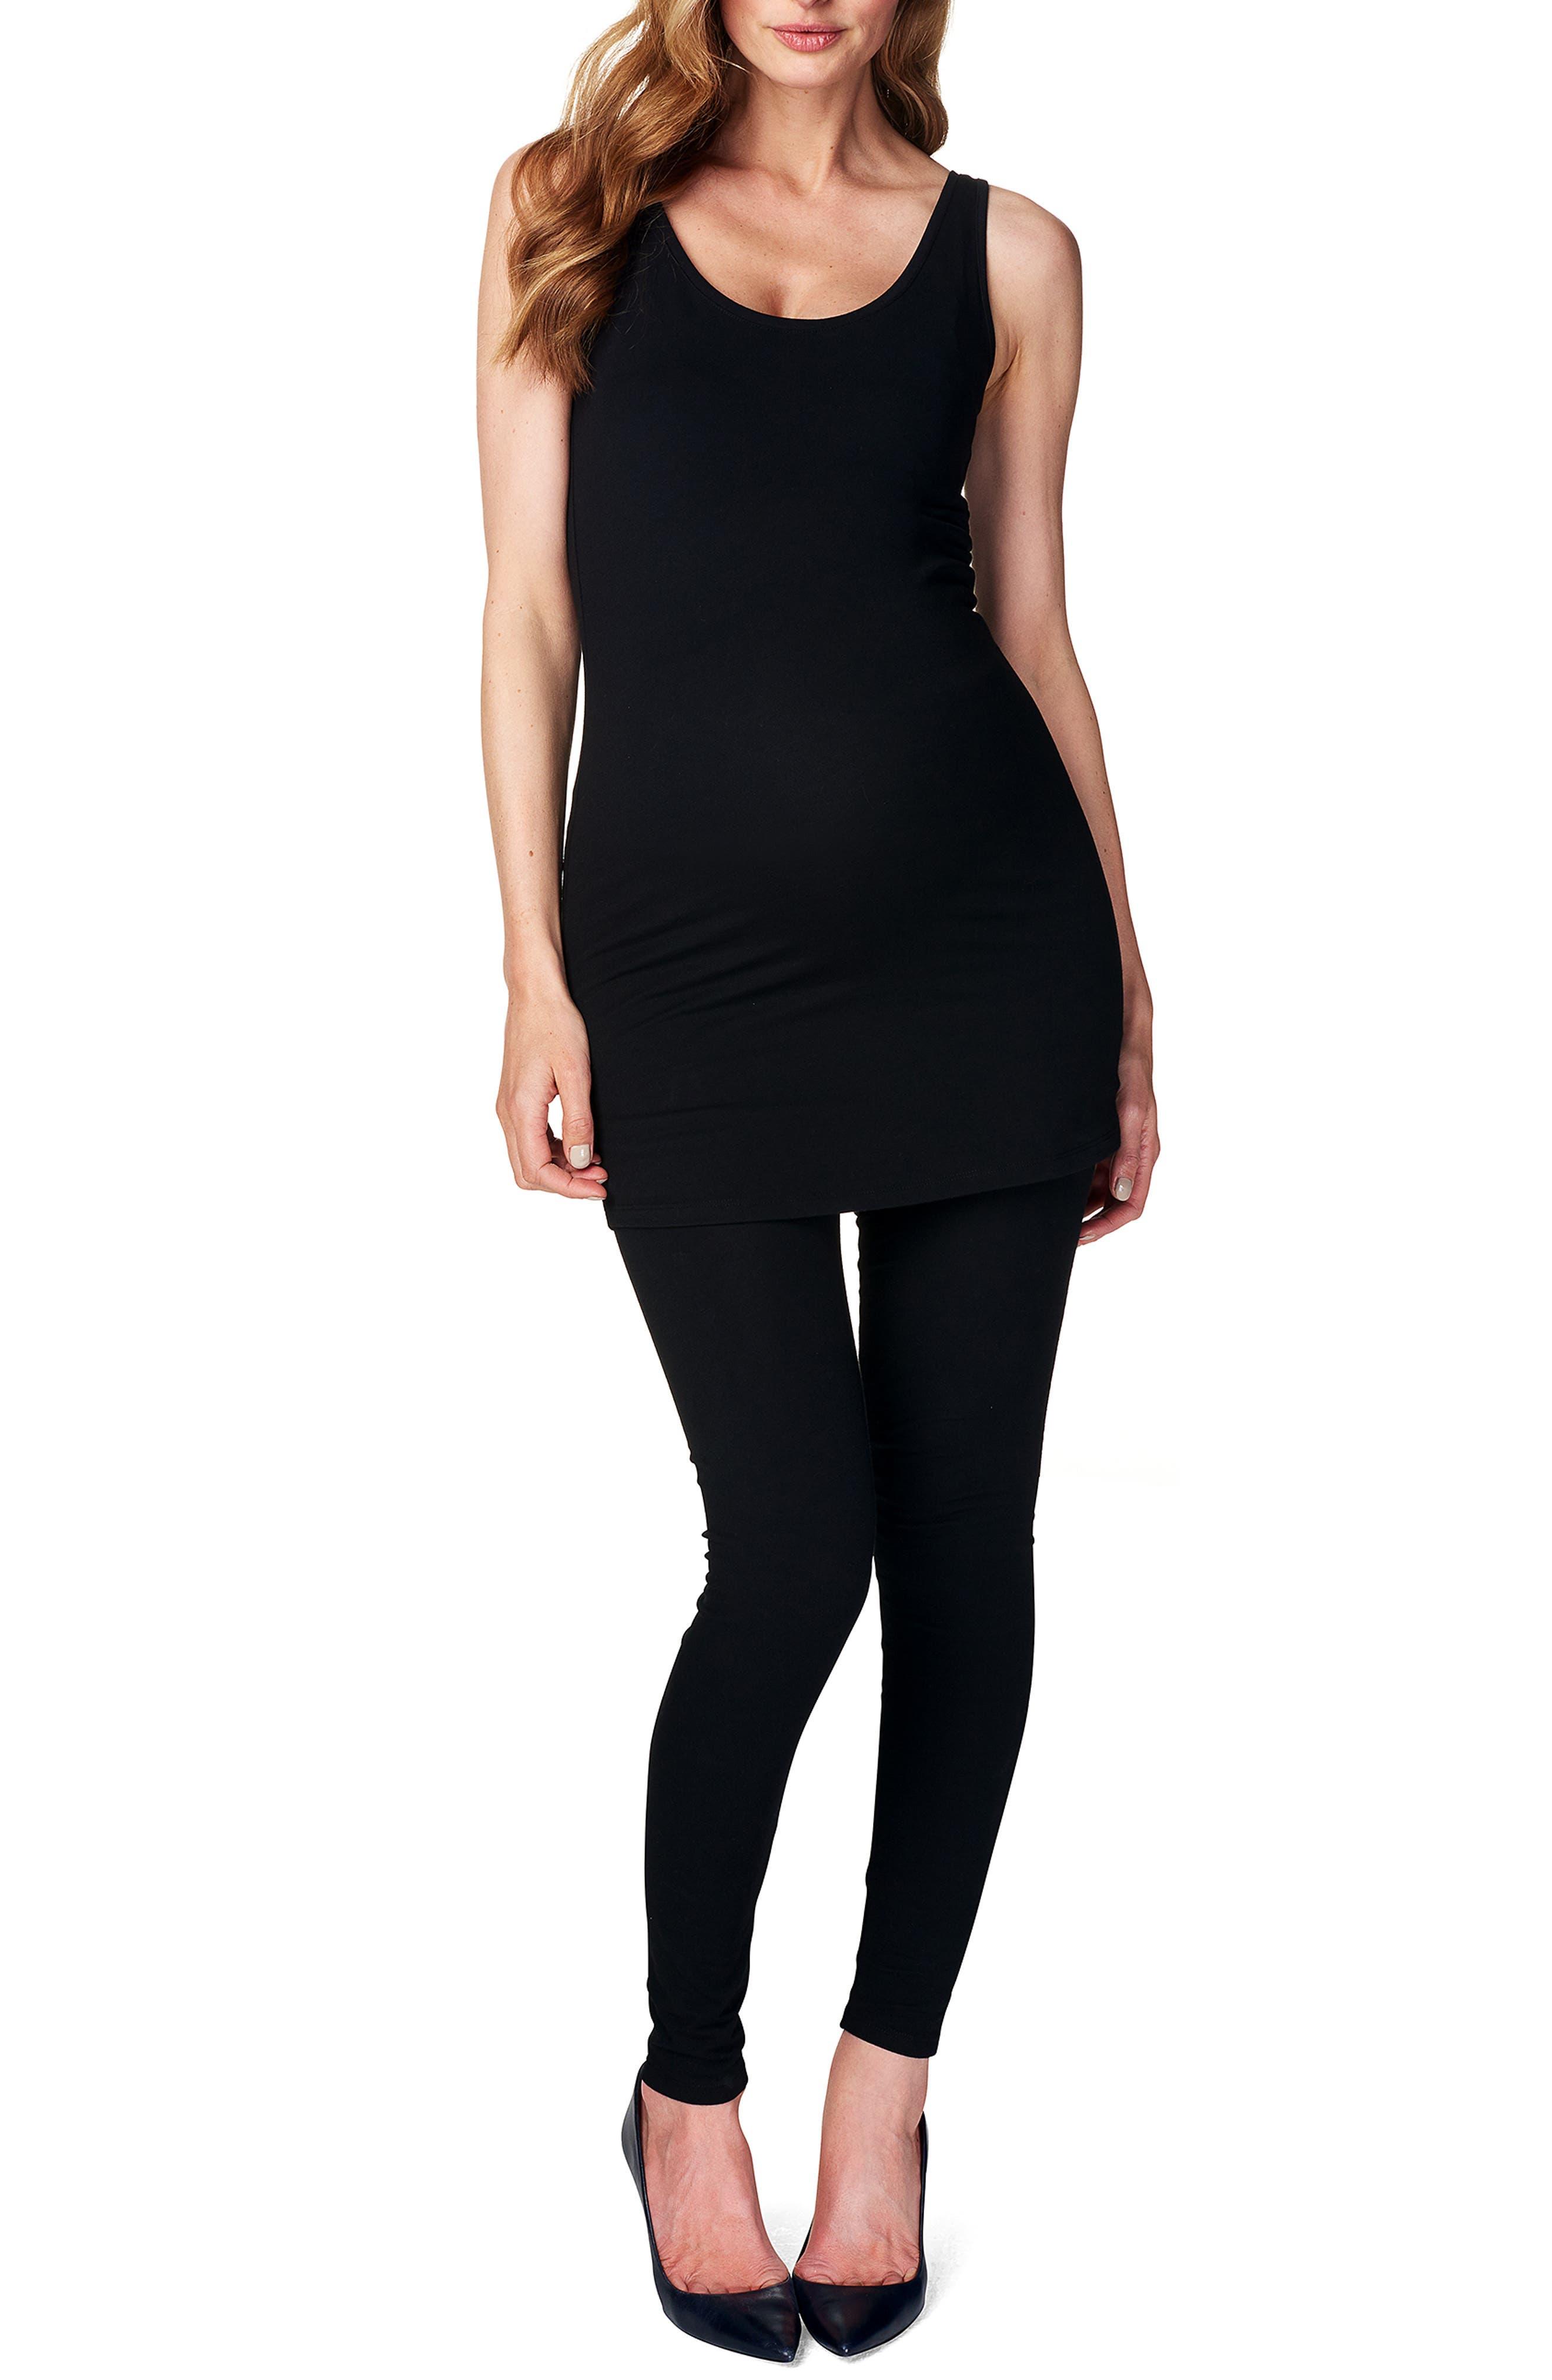 'Amsterdam' Scoop Neck Long Maternity Top,                             Alternate thumbnail 3, color,                             BLACK